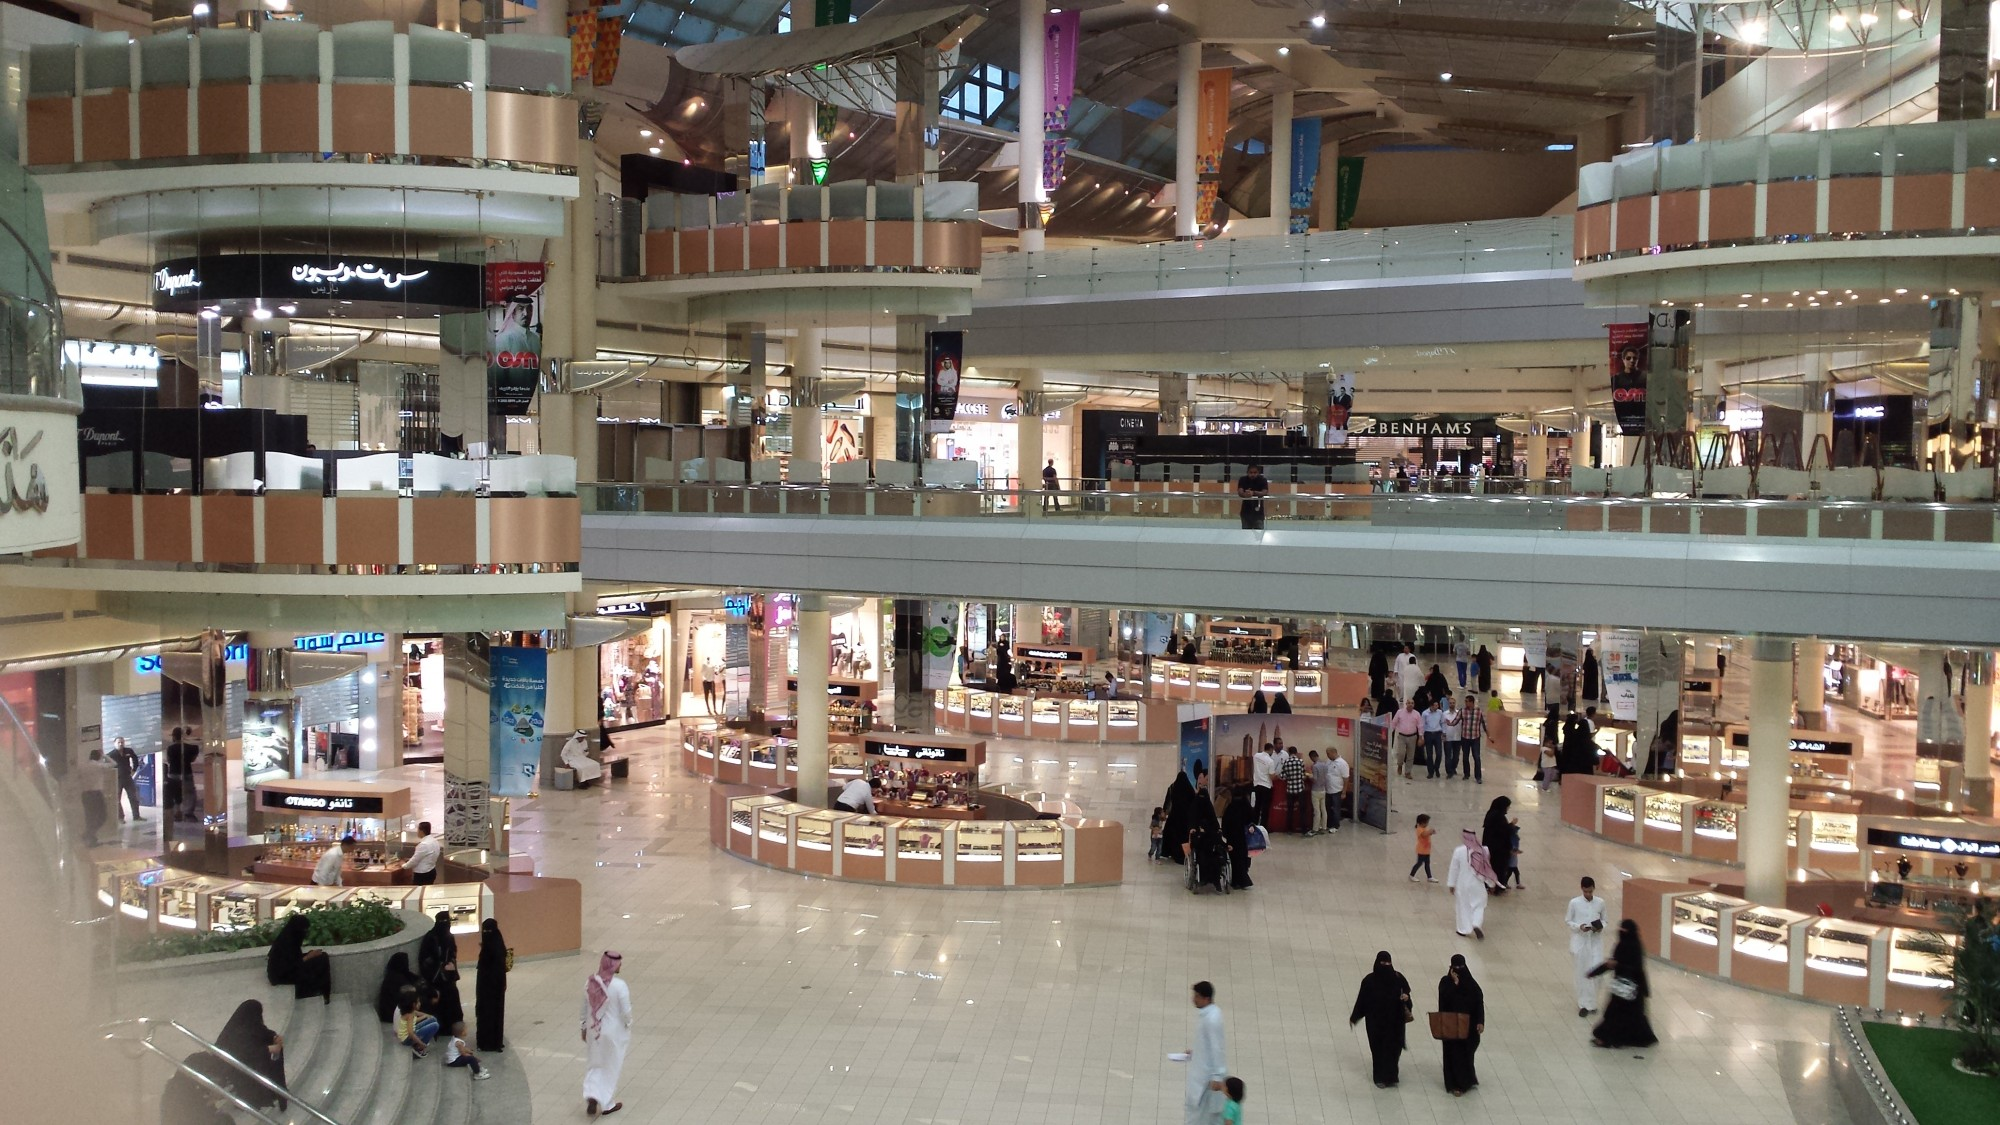 f3cbafa05d3a1 أرخص خمس أسواق شعبية في مكة